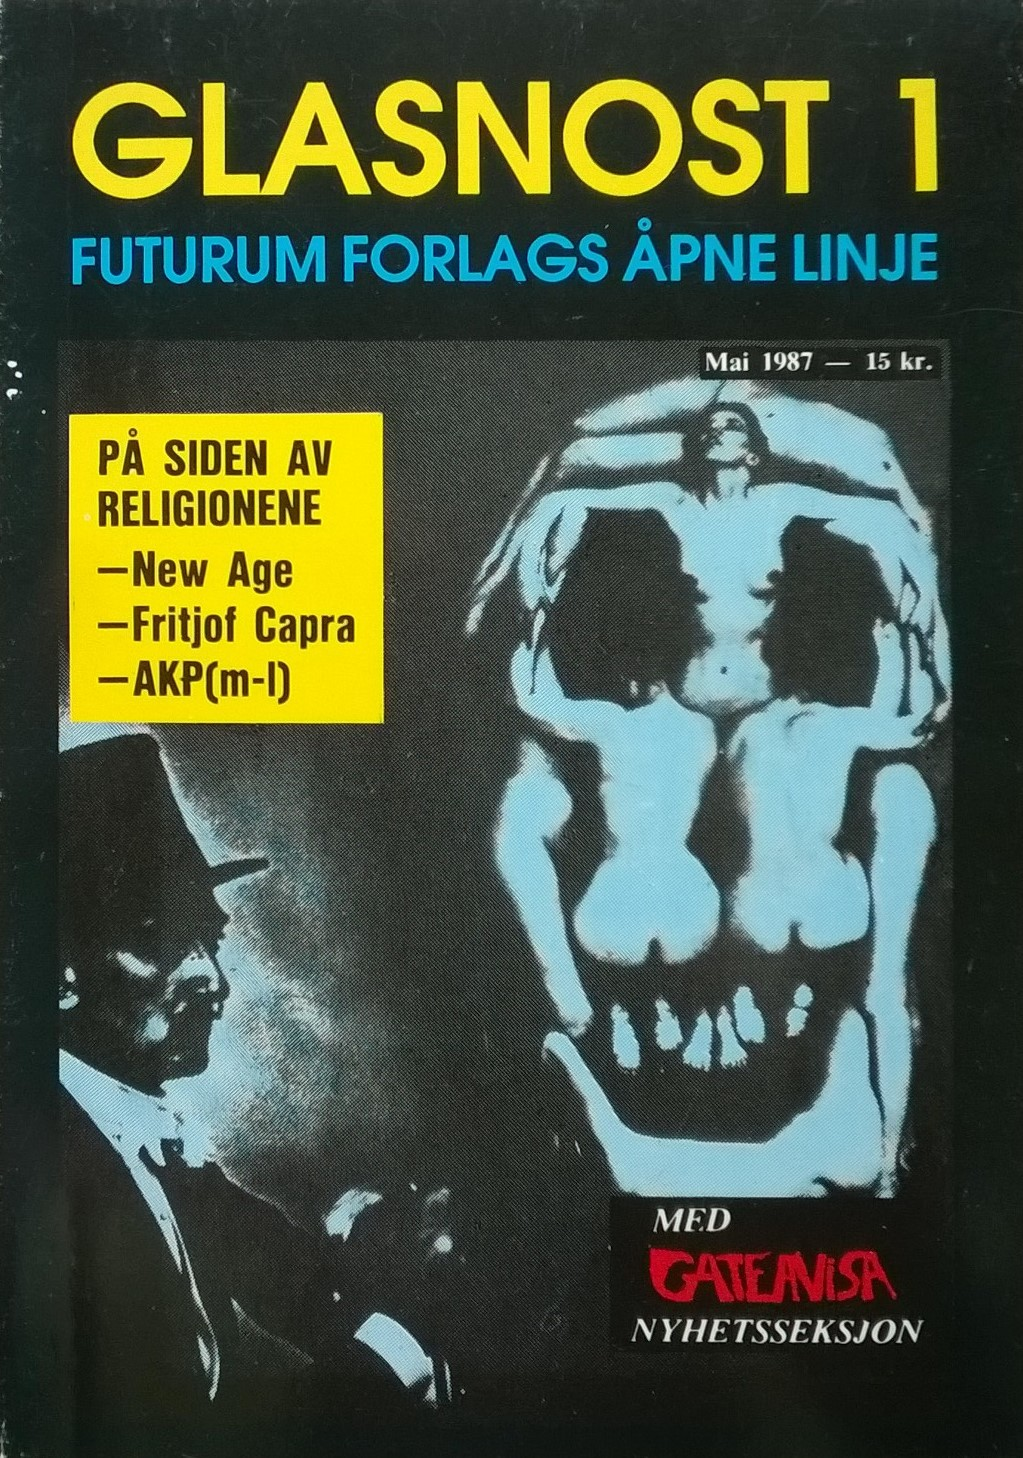 Axelsen, Jonny, Audun Engh, Thomas Hylland Eriksen, Richard Kristensen, Egil Stenseth (red.) Glasnost 1: Futurum Forlags åpne linje, mai 1987